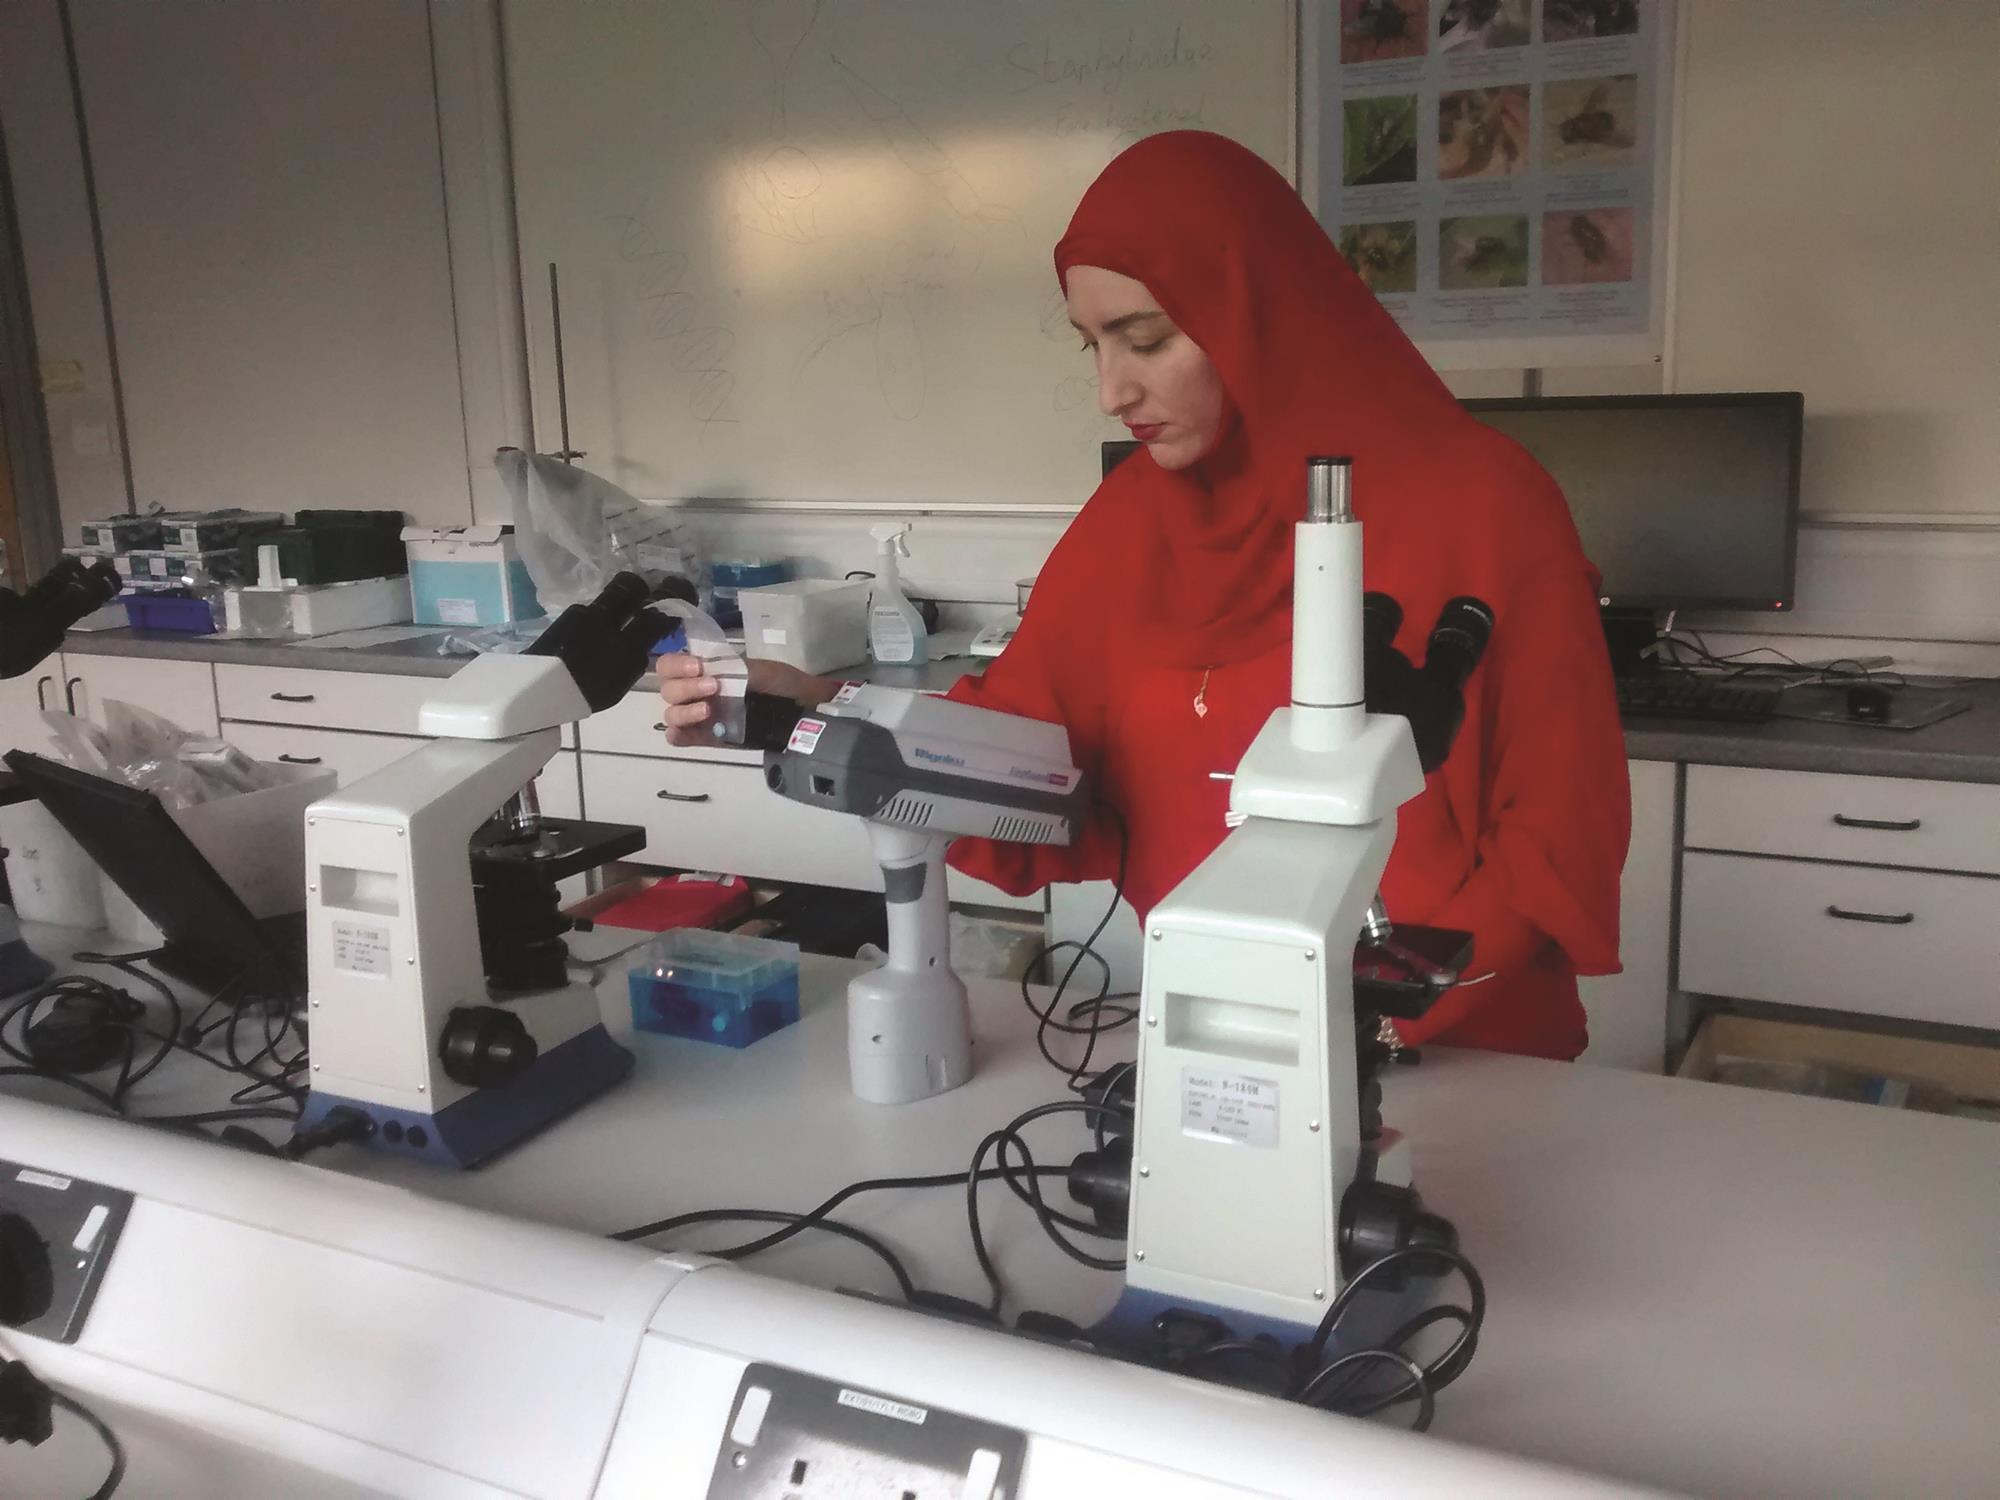 Handheld spectrometers   Feature   Chemistry World